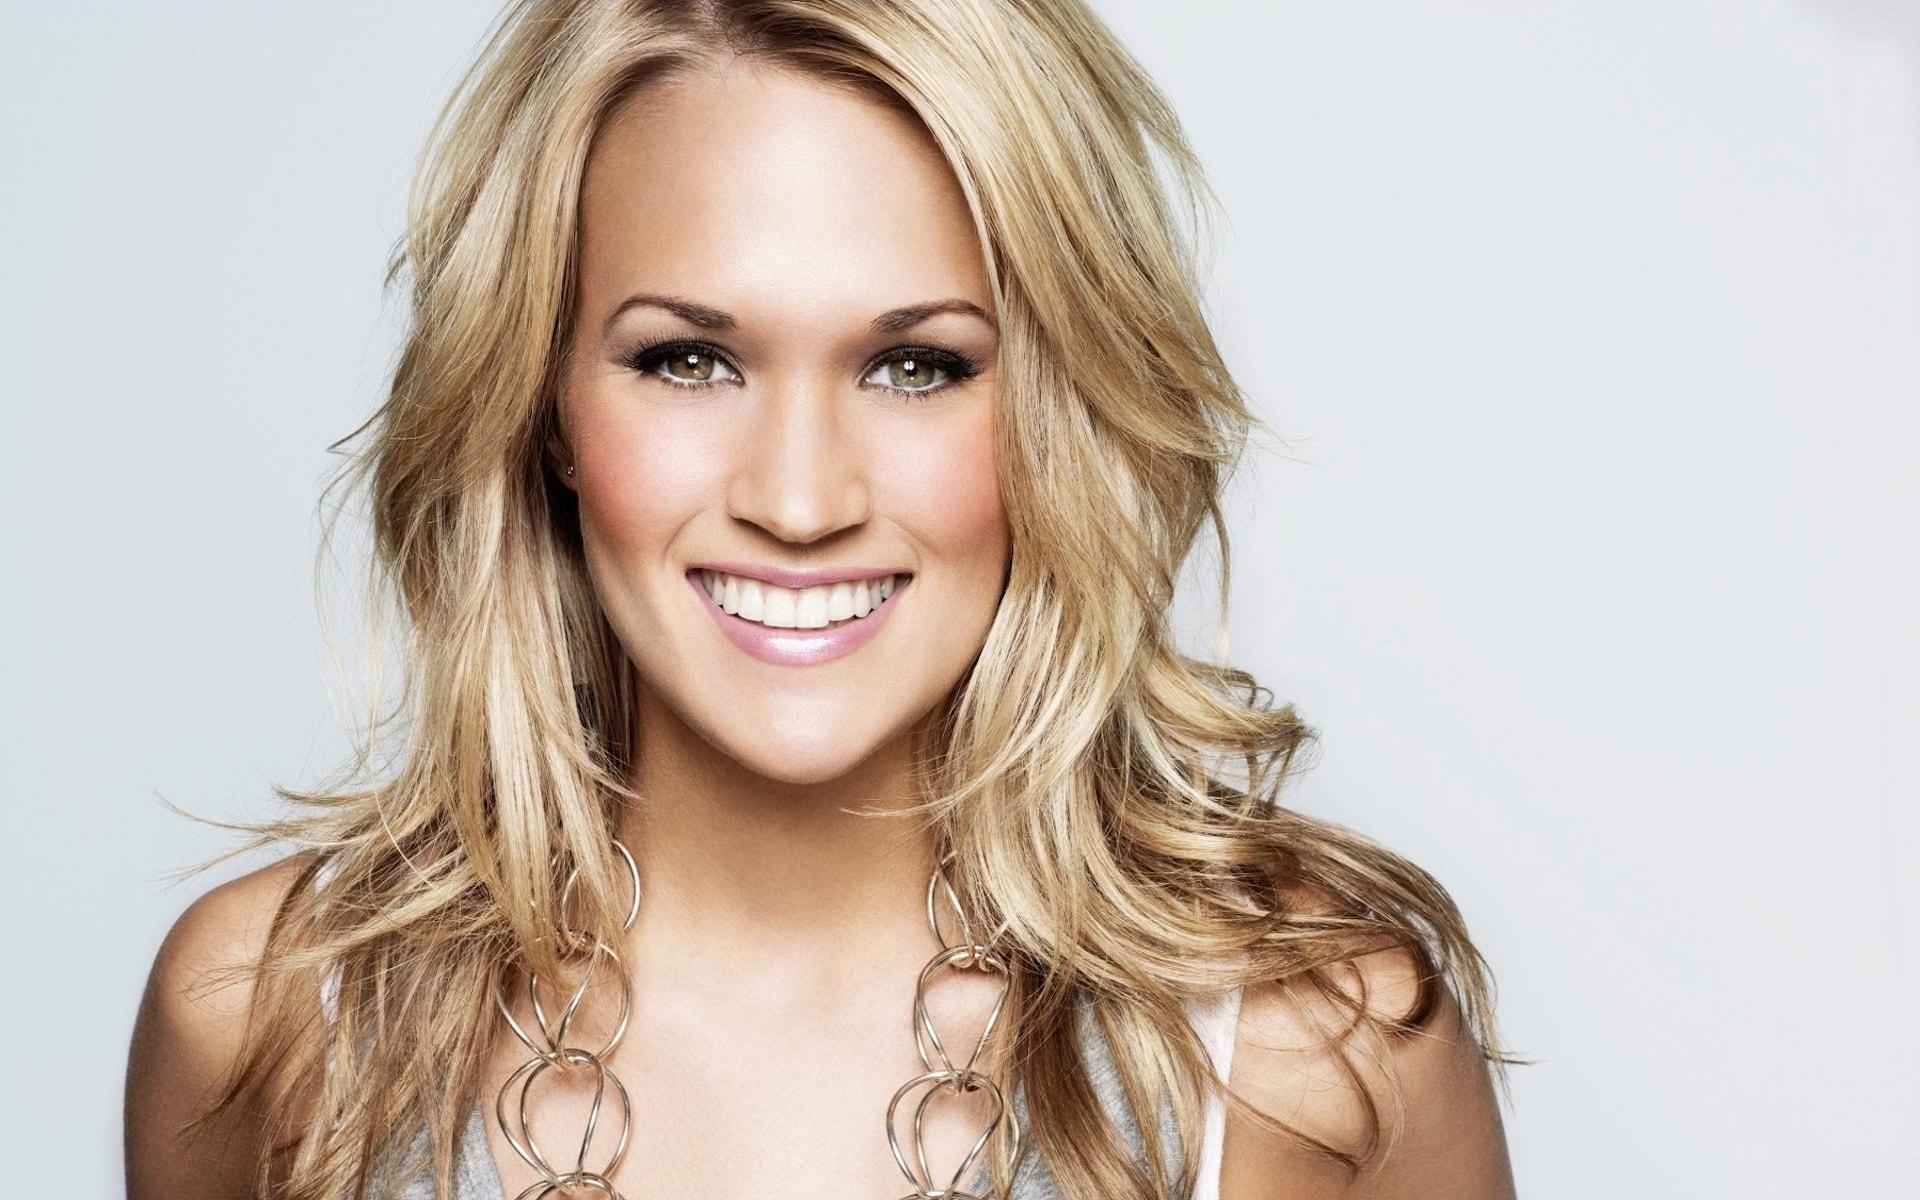 Carrie Underwood Wallpapers